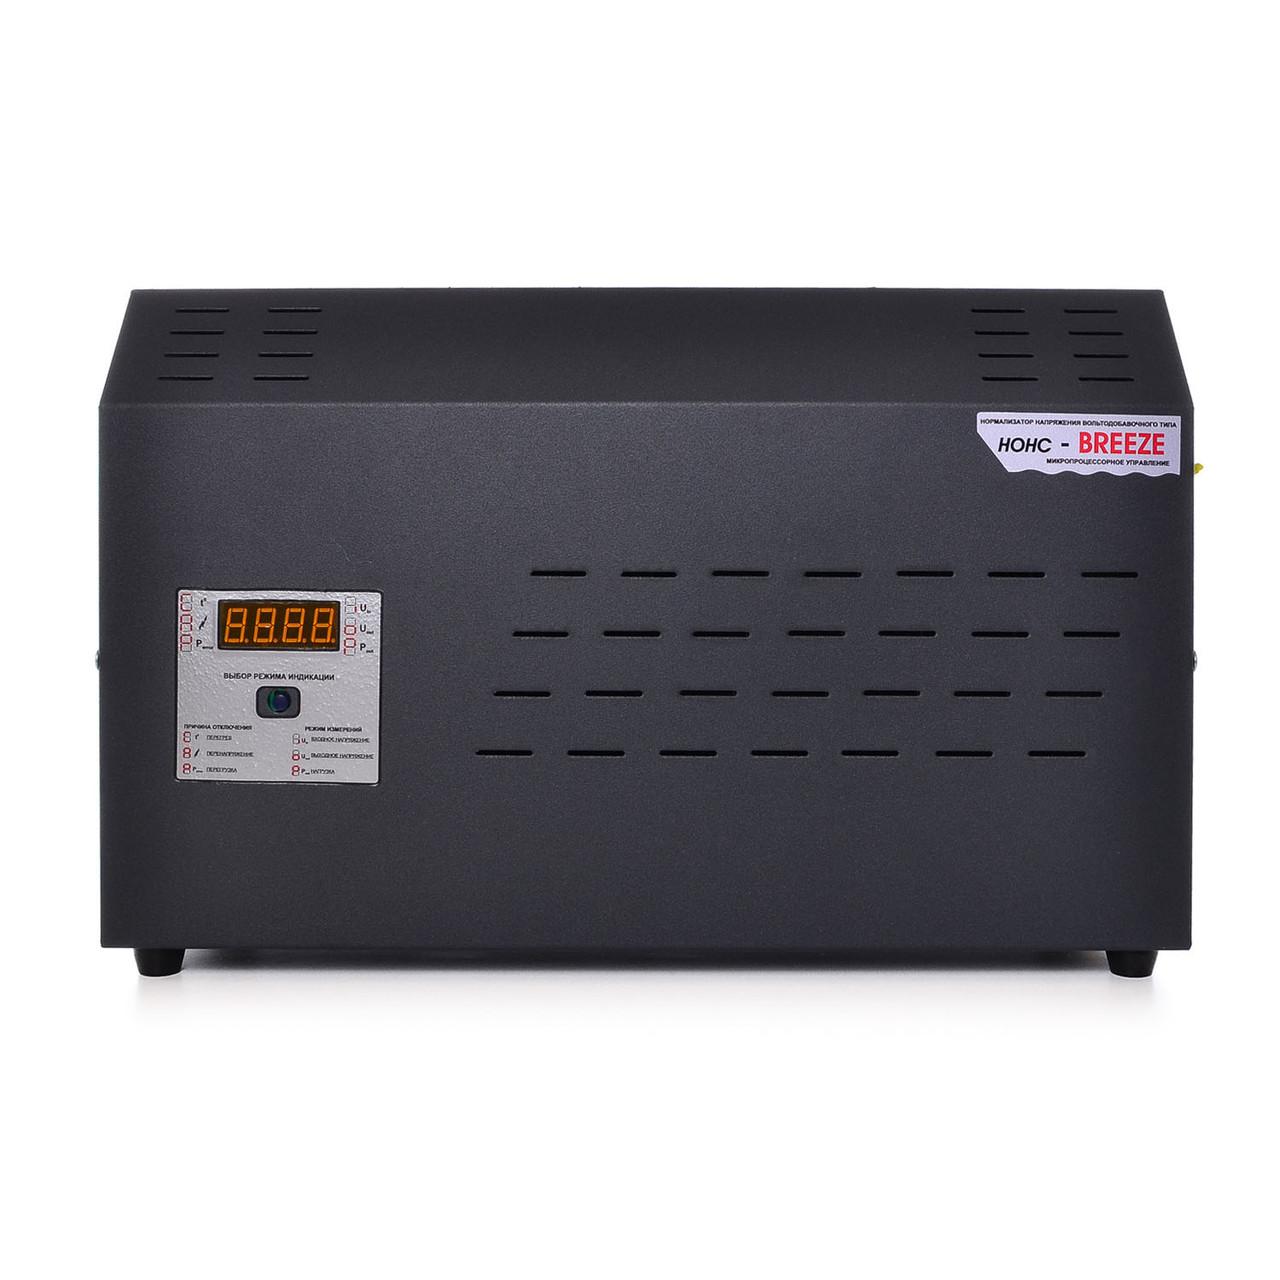 Стабилизатор NONS-7,0 кВт BREEZE 32А